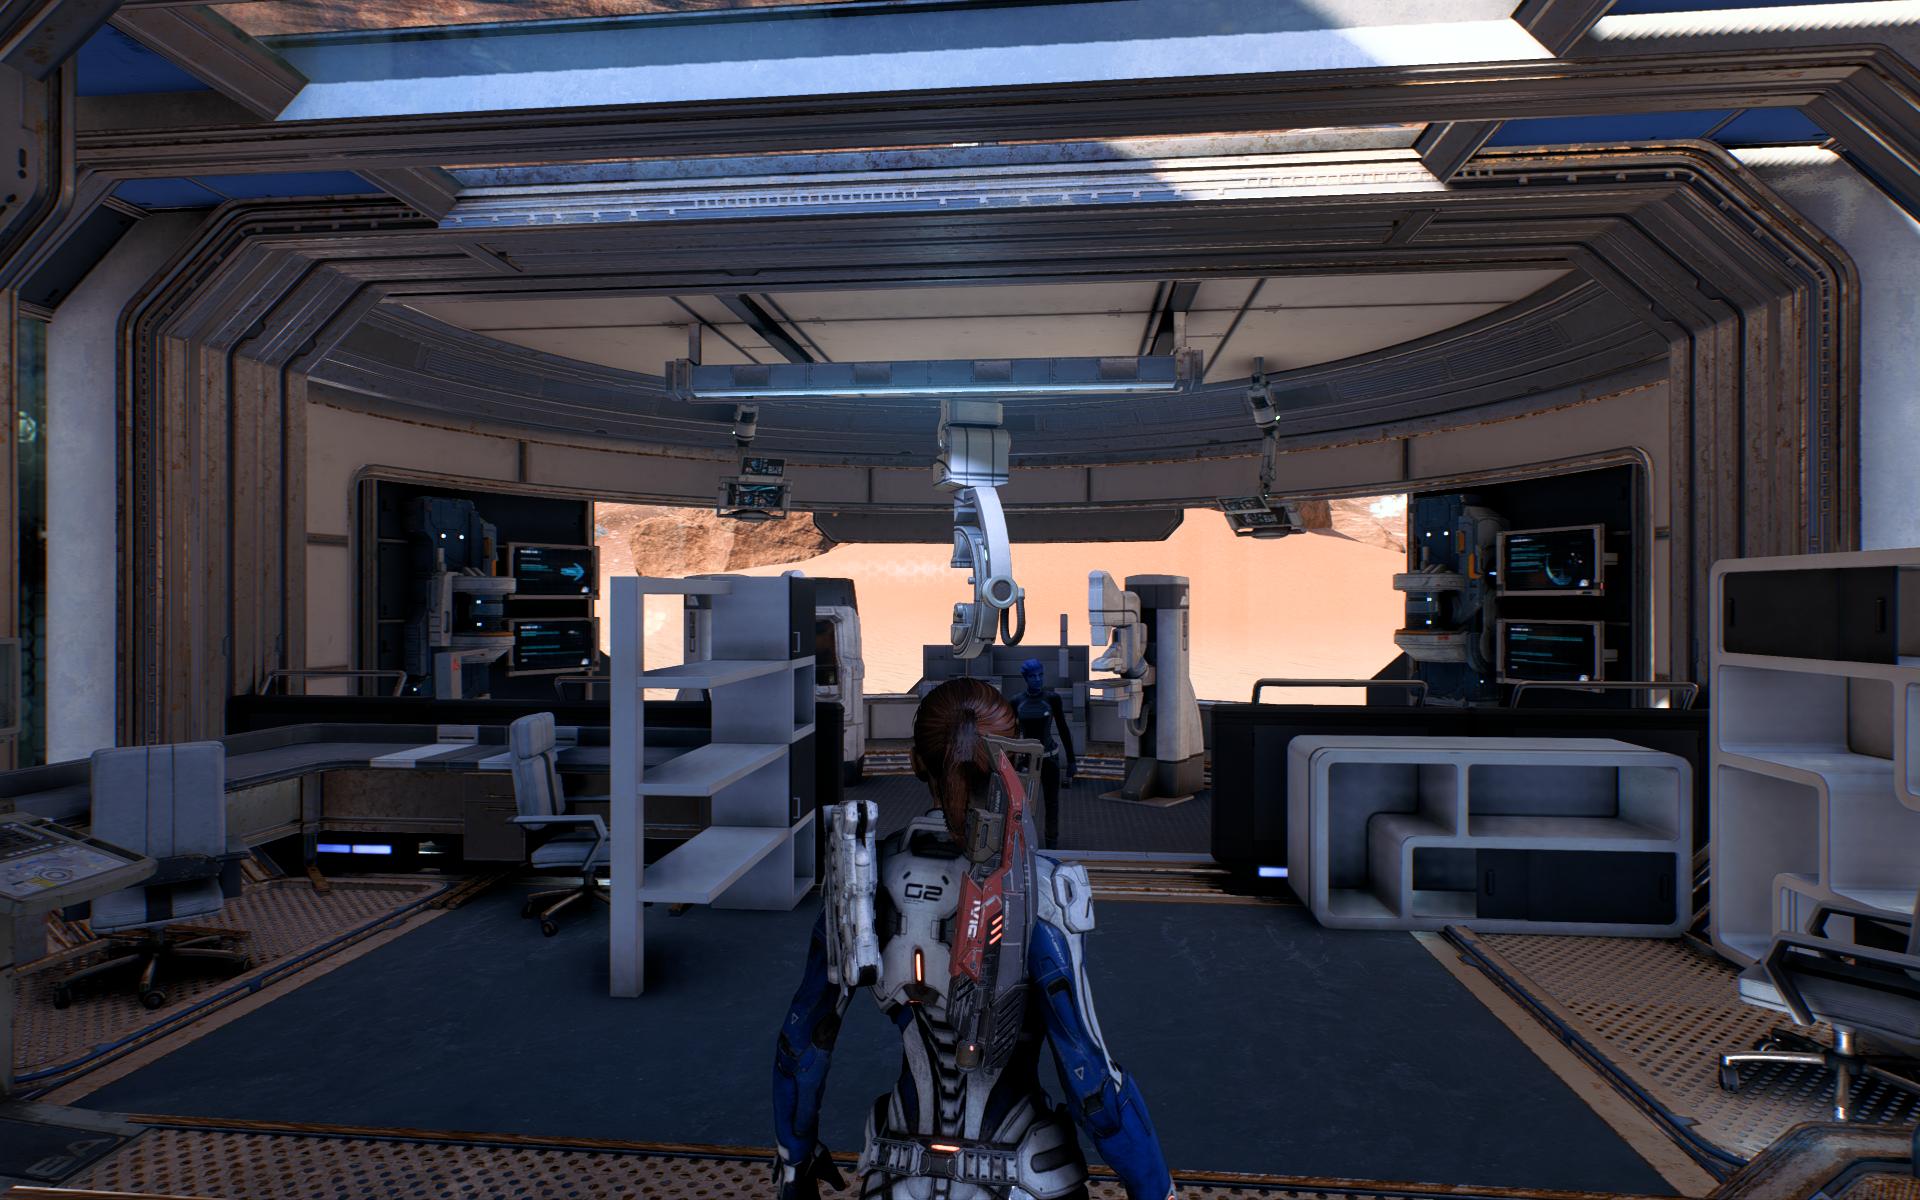 Mass Effect Andromeda Screenshot  - 01.38.38.52.png - Mass Effect: Andromeda